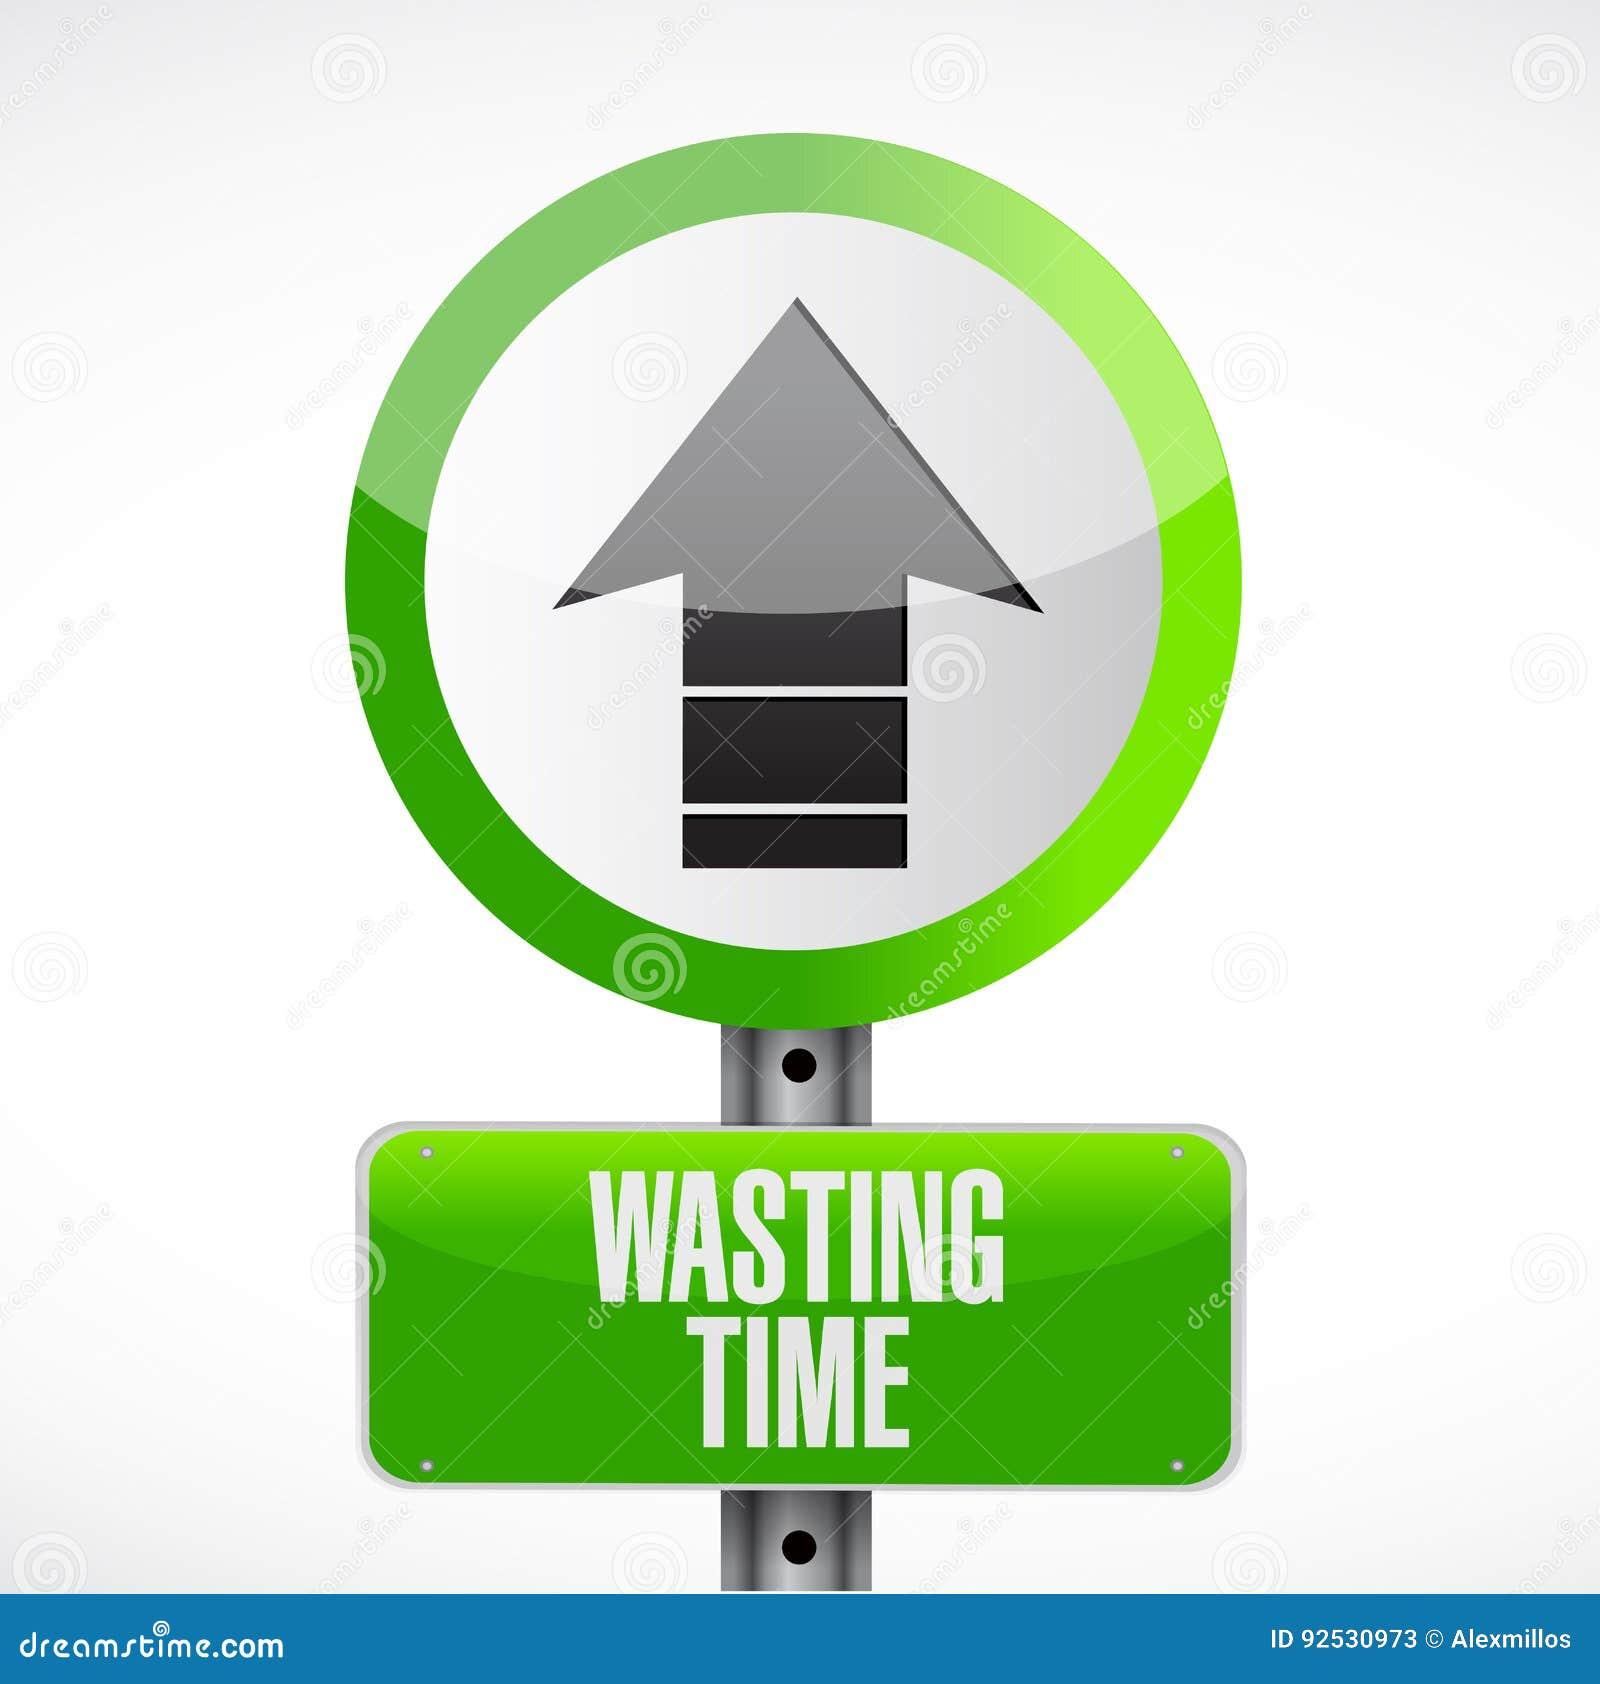 Wasting time road sign concept illustration